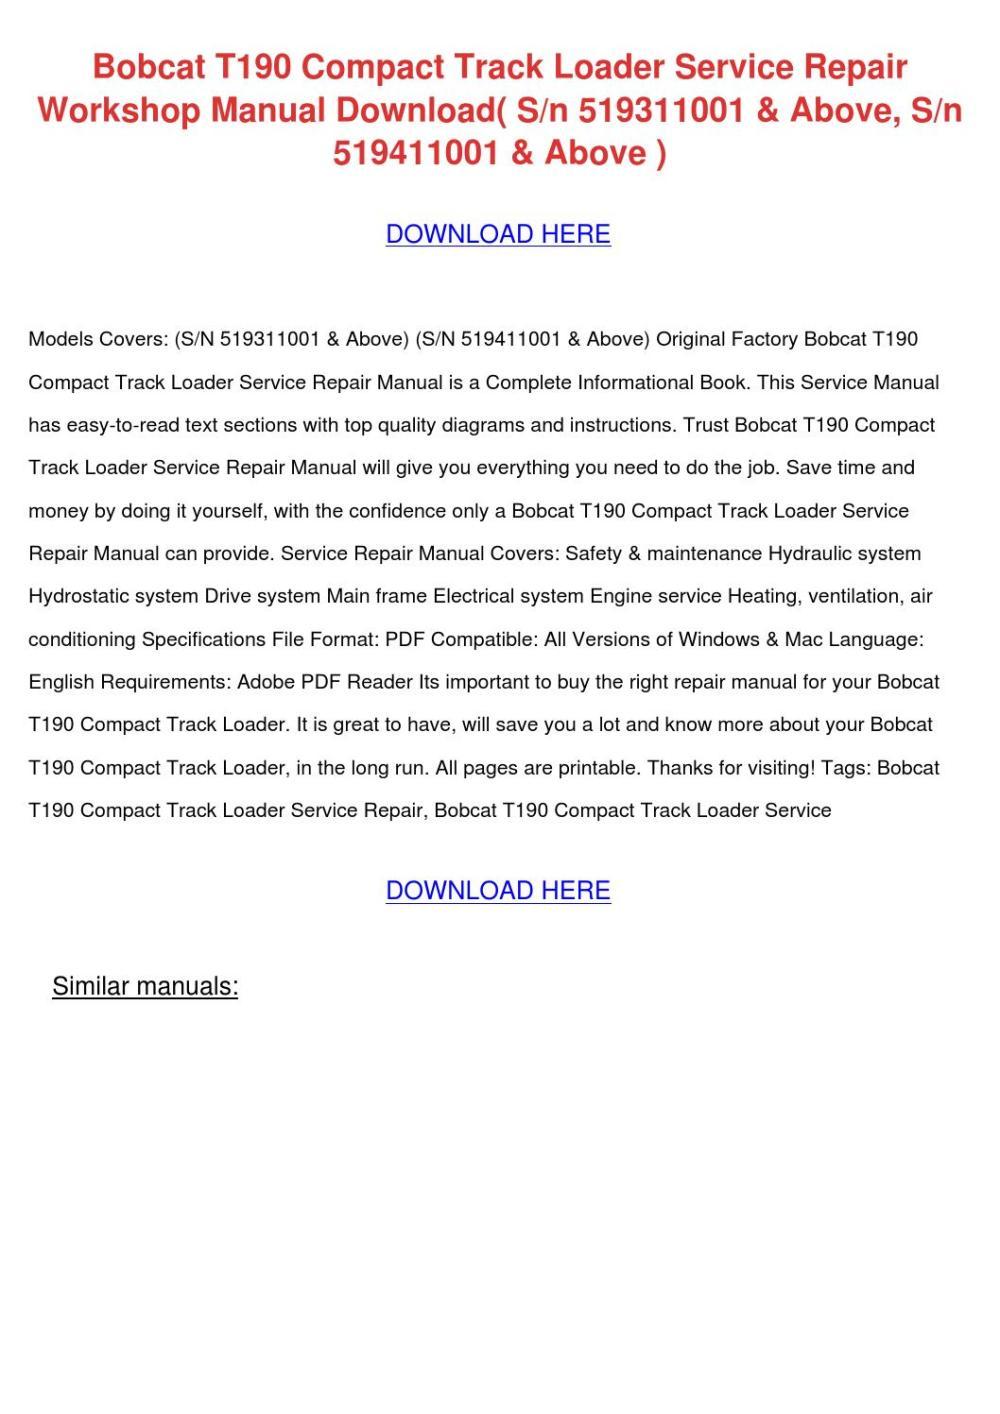 medium resolution of bobcat t190 compact track loader service repa